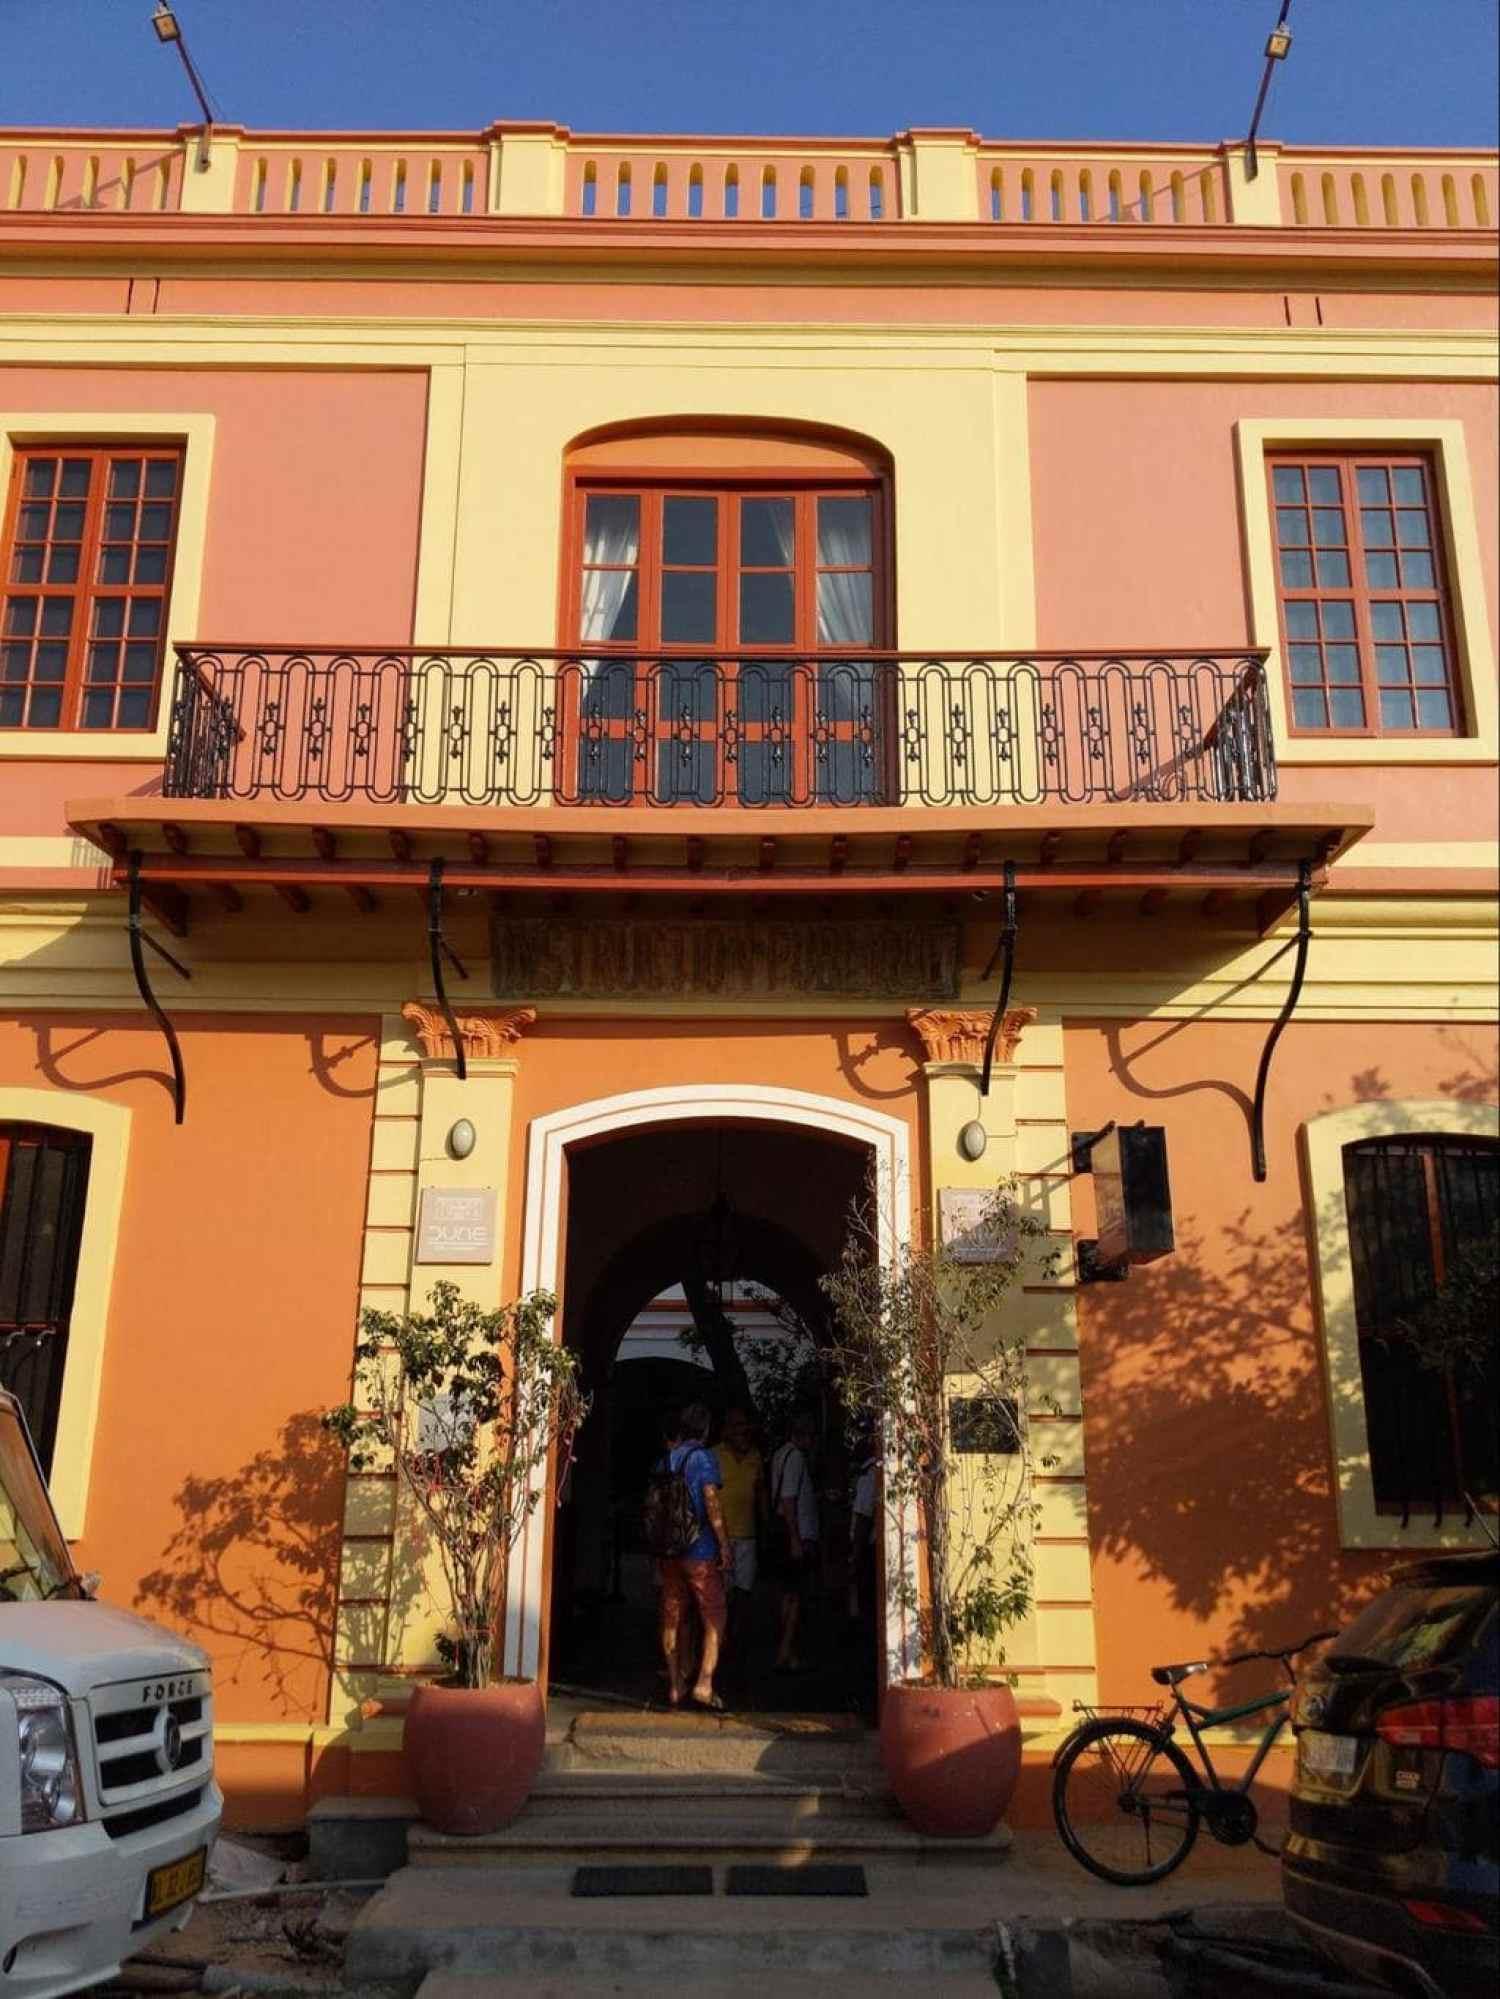 French Quarter building in Pondicherry